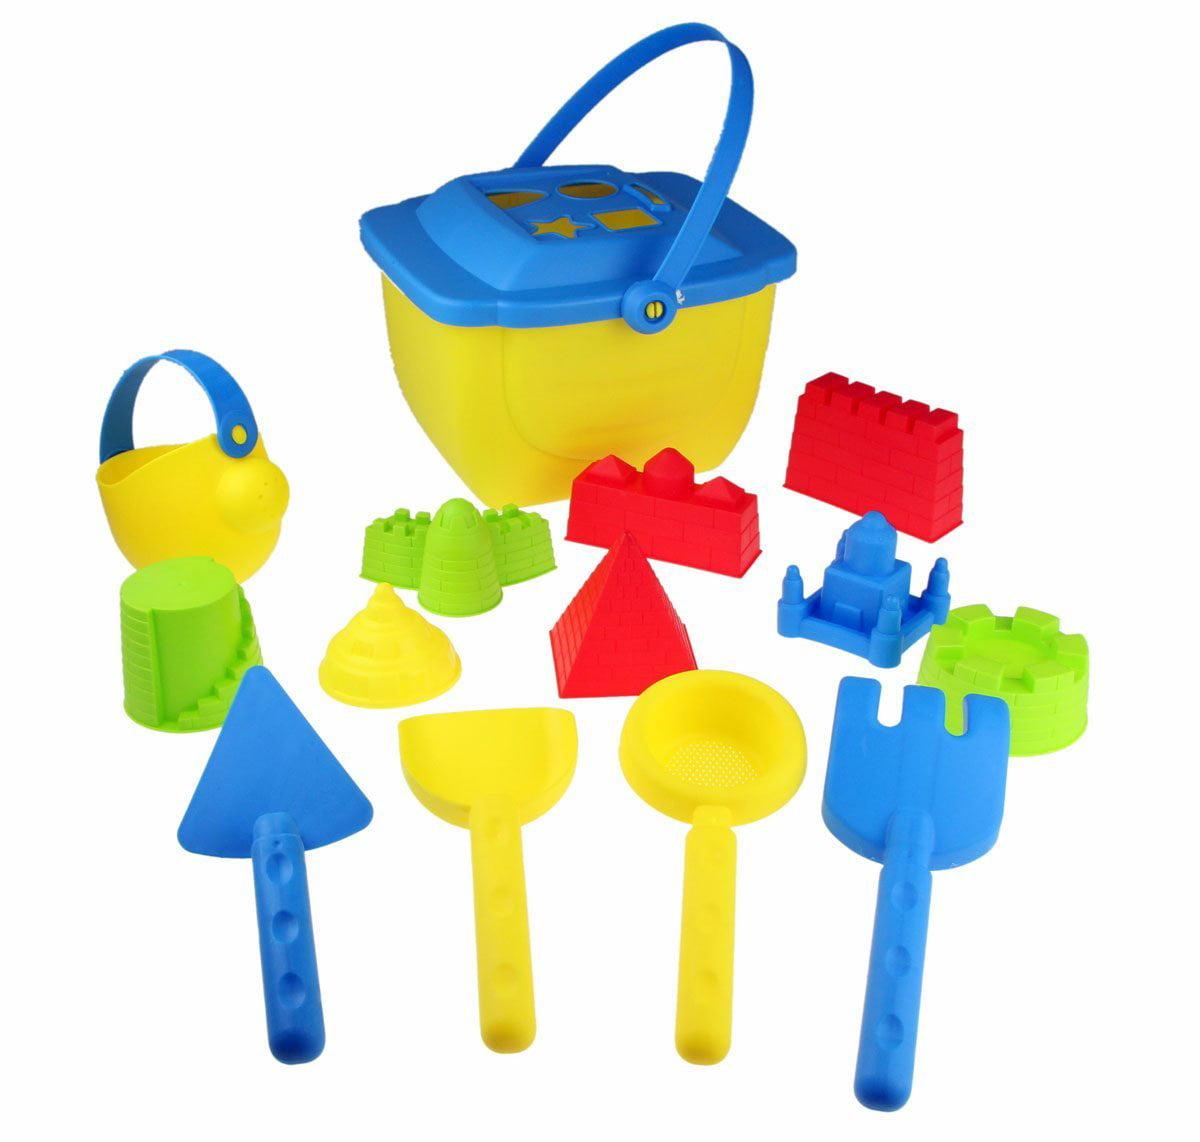 15-Pieces Beach Sand Toys Set for Boys by Bo-Toys